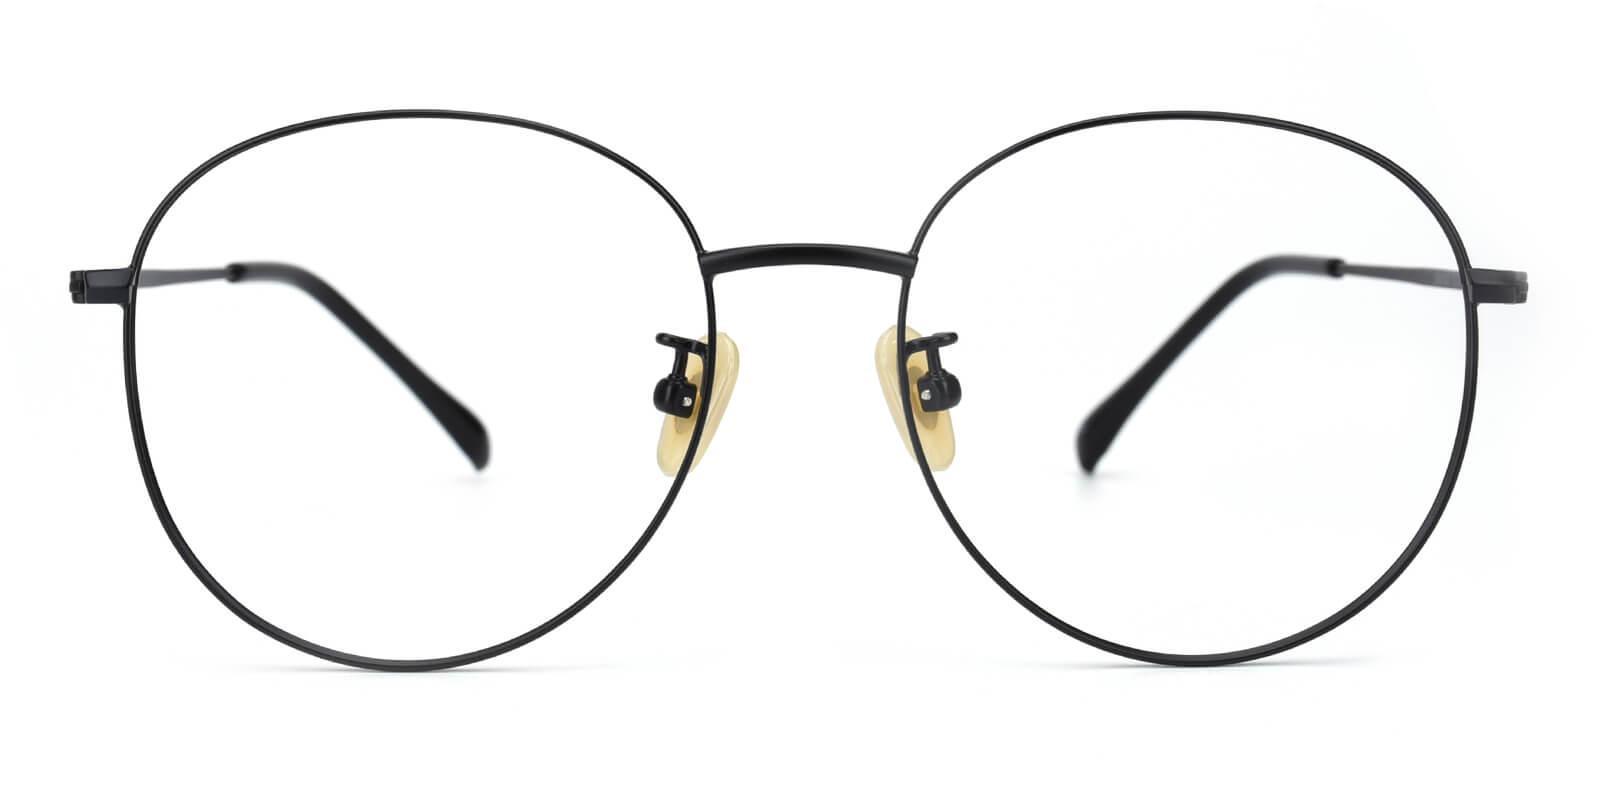 Mondigo-Black-Round-Titanium-Eyeglasses-additional2